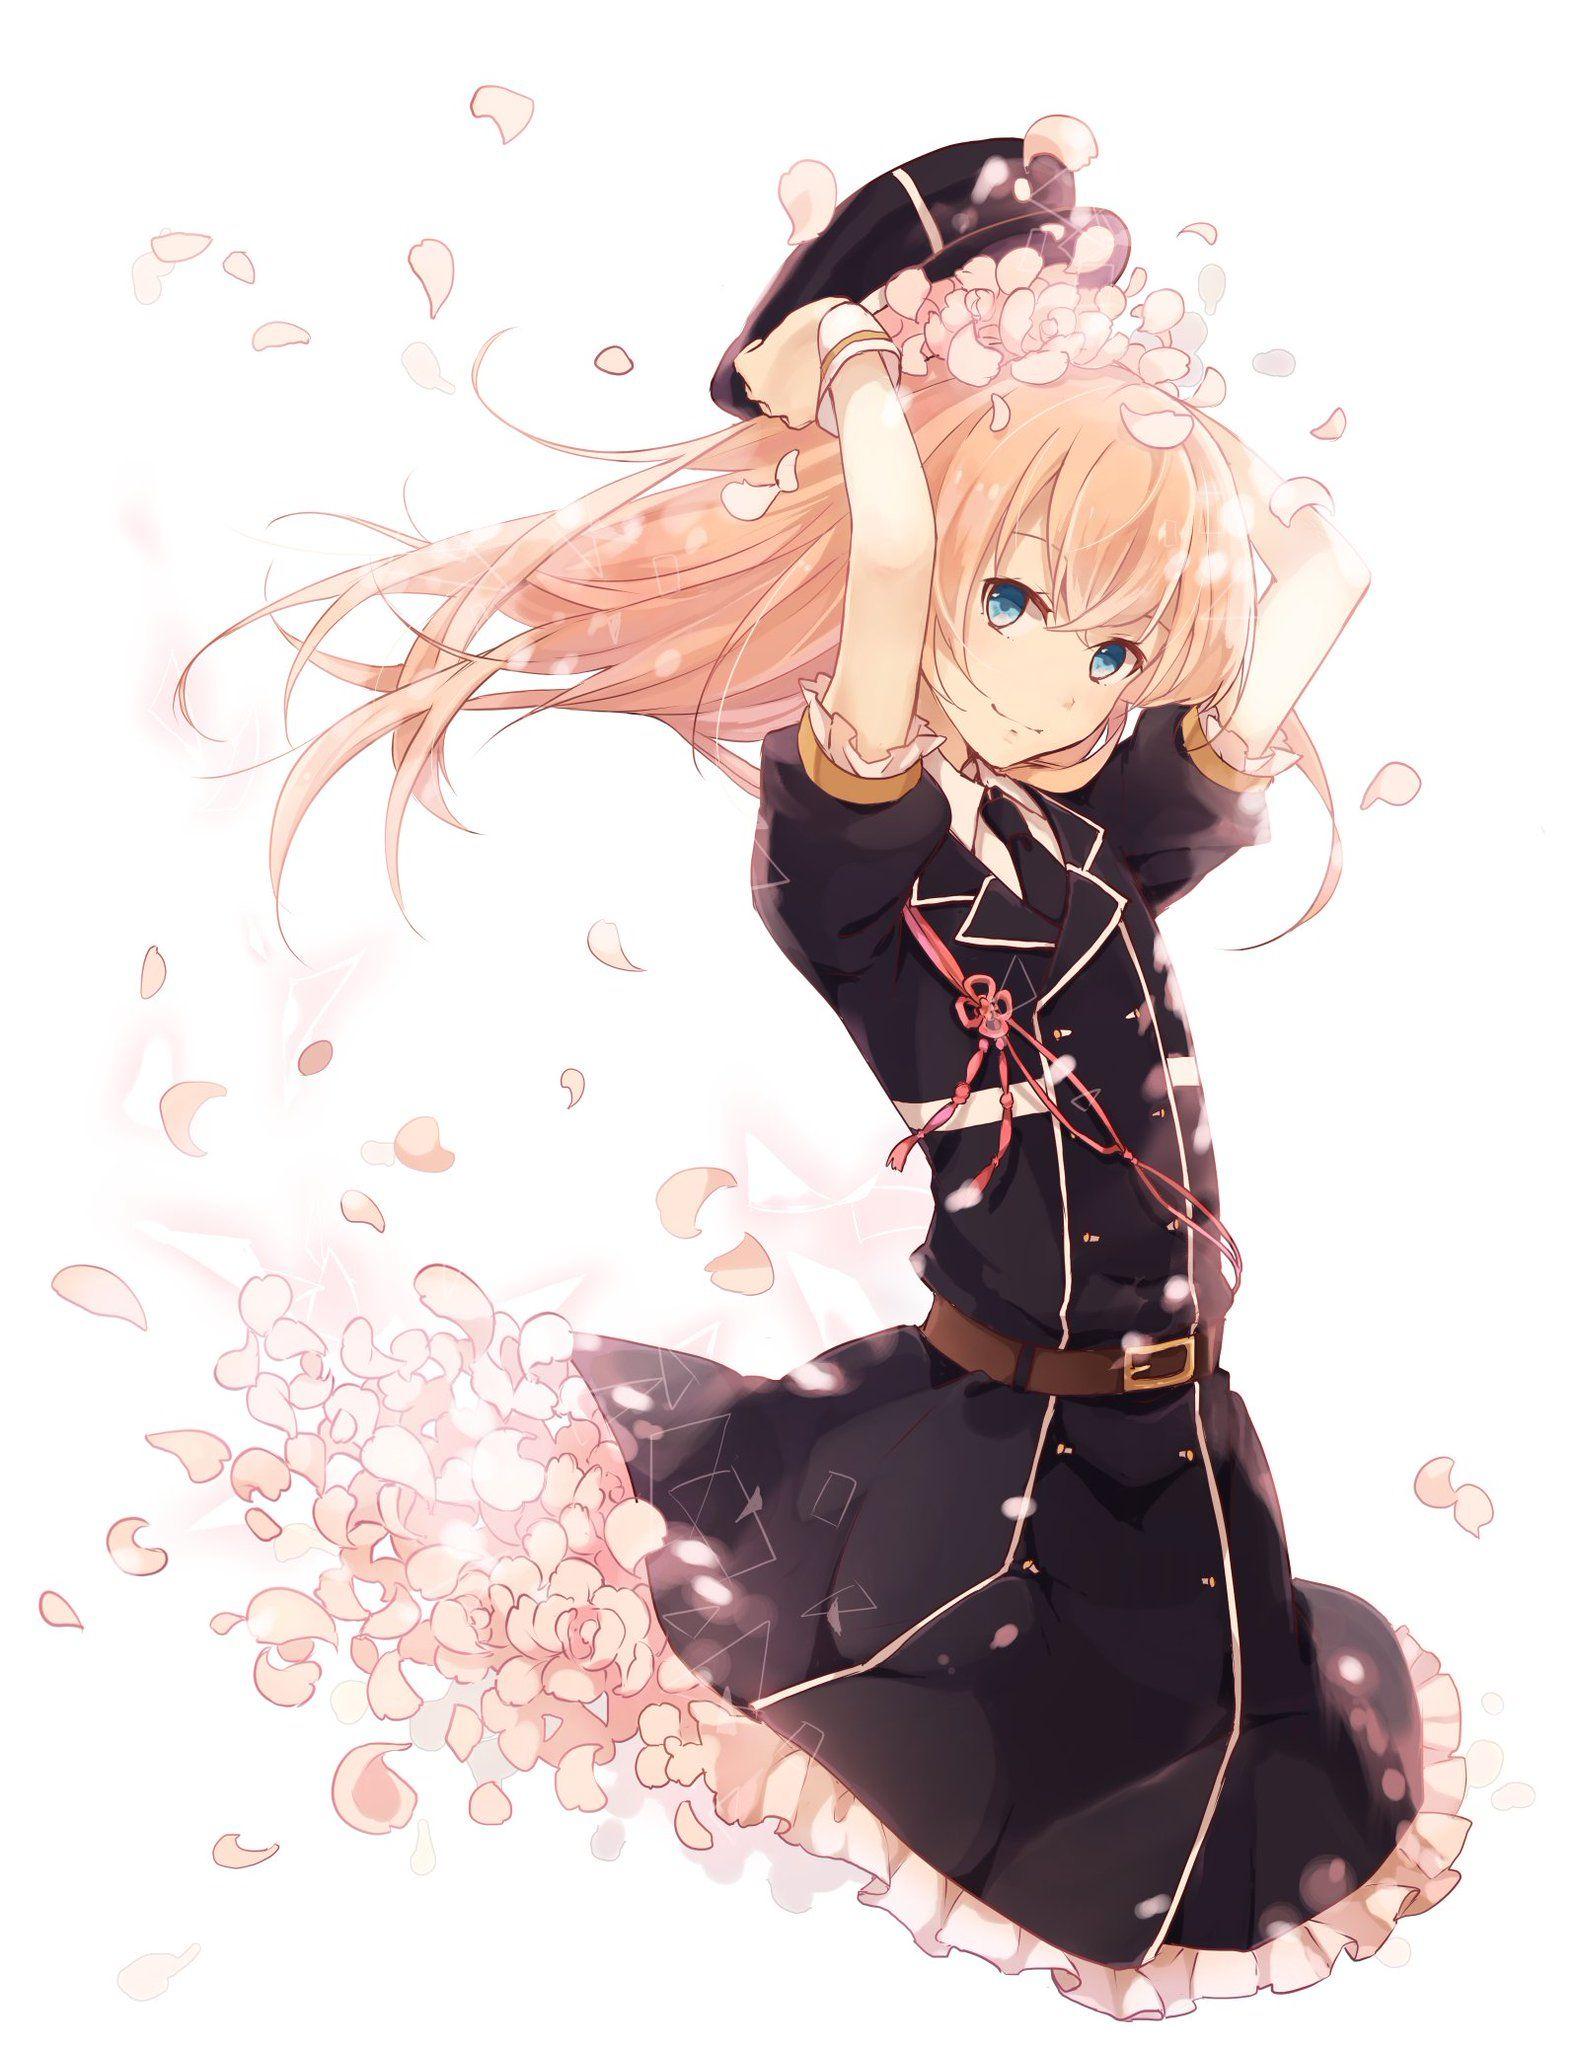 Dessin de manga fille blonde dessin de manga - Fille en manga ...